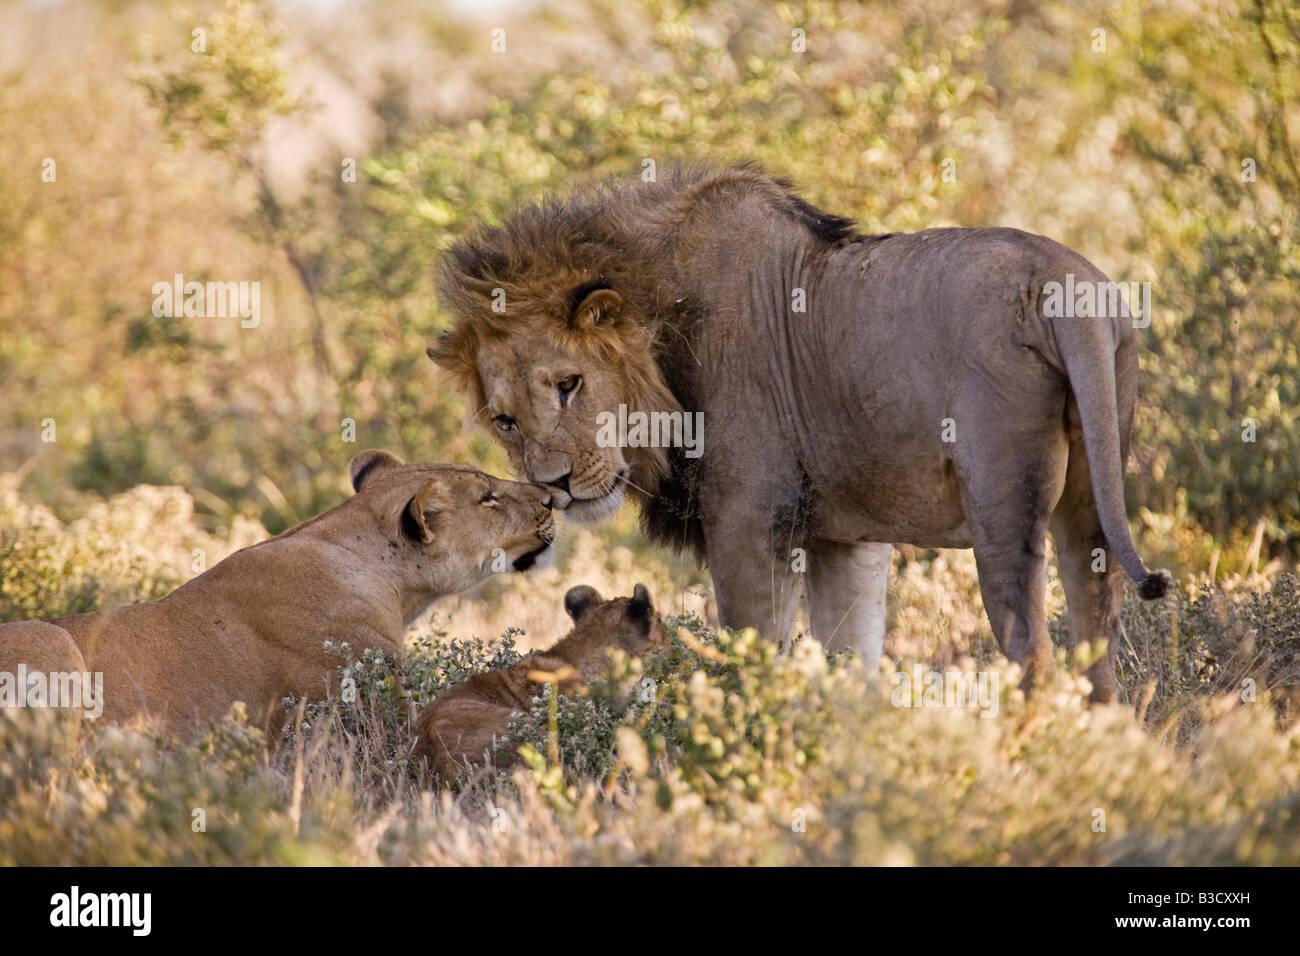 Africa, Botswana, African Lion (Panthera leo) Lioness (Panthera leo) and cub - Stock Image